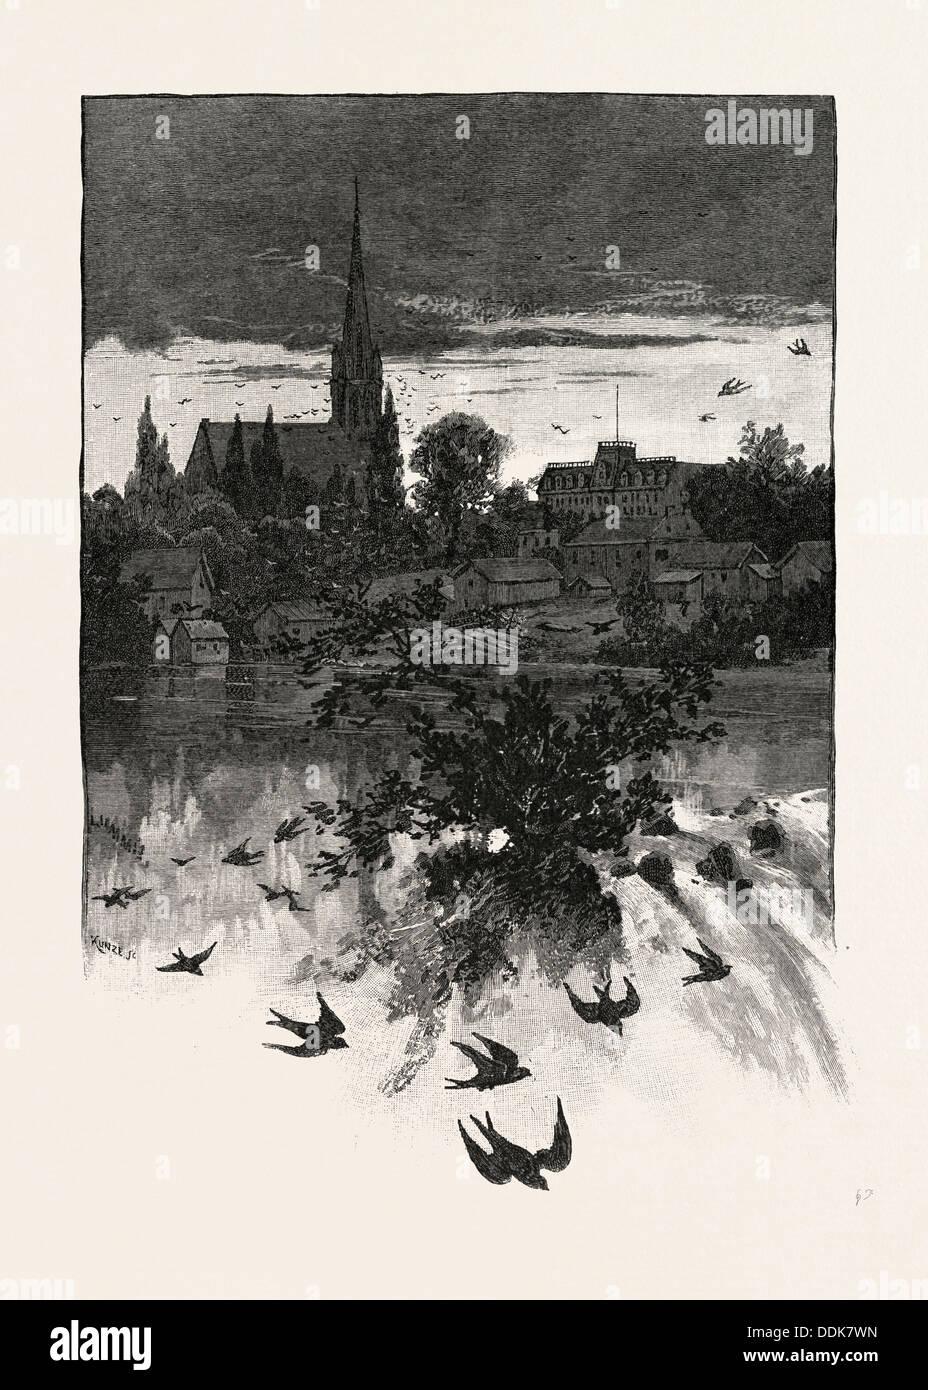 STRATFORD, CANADA, NINETEENTH CENTURY ENGRAVING - Stock Image